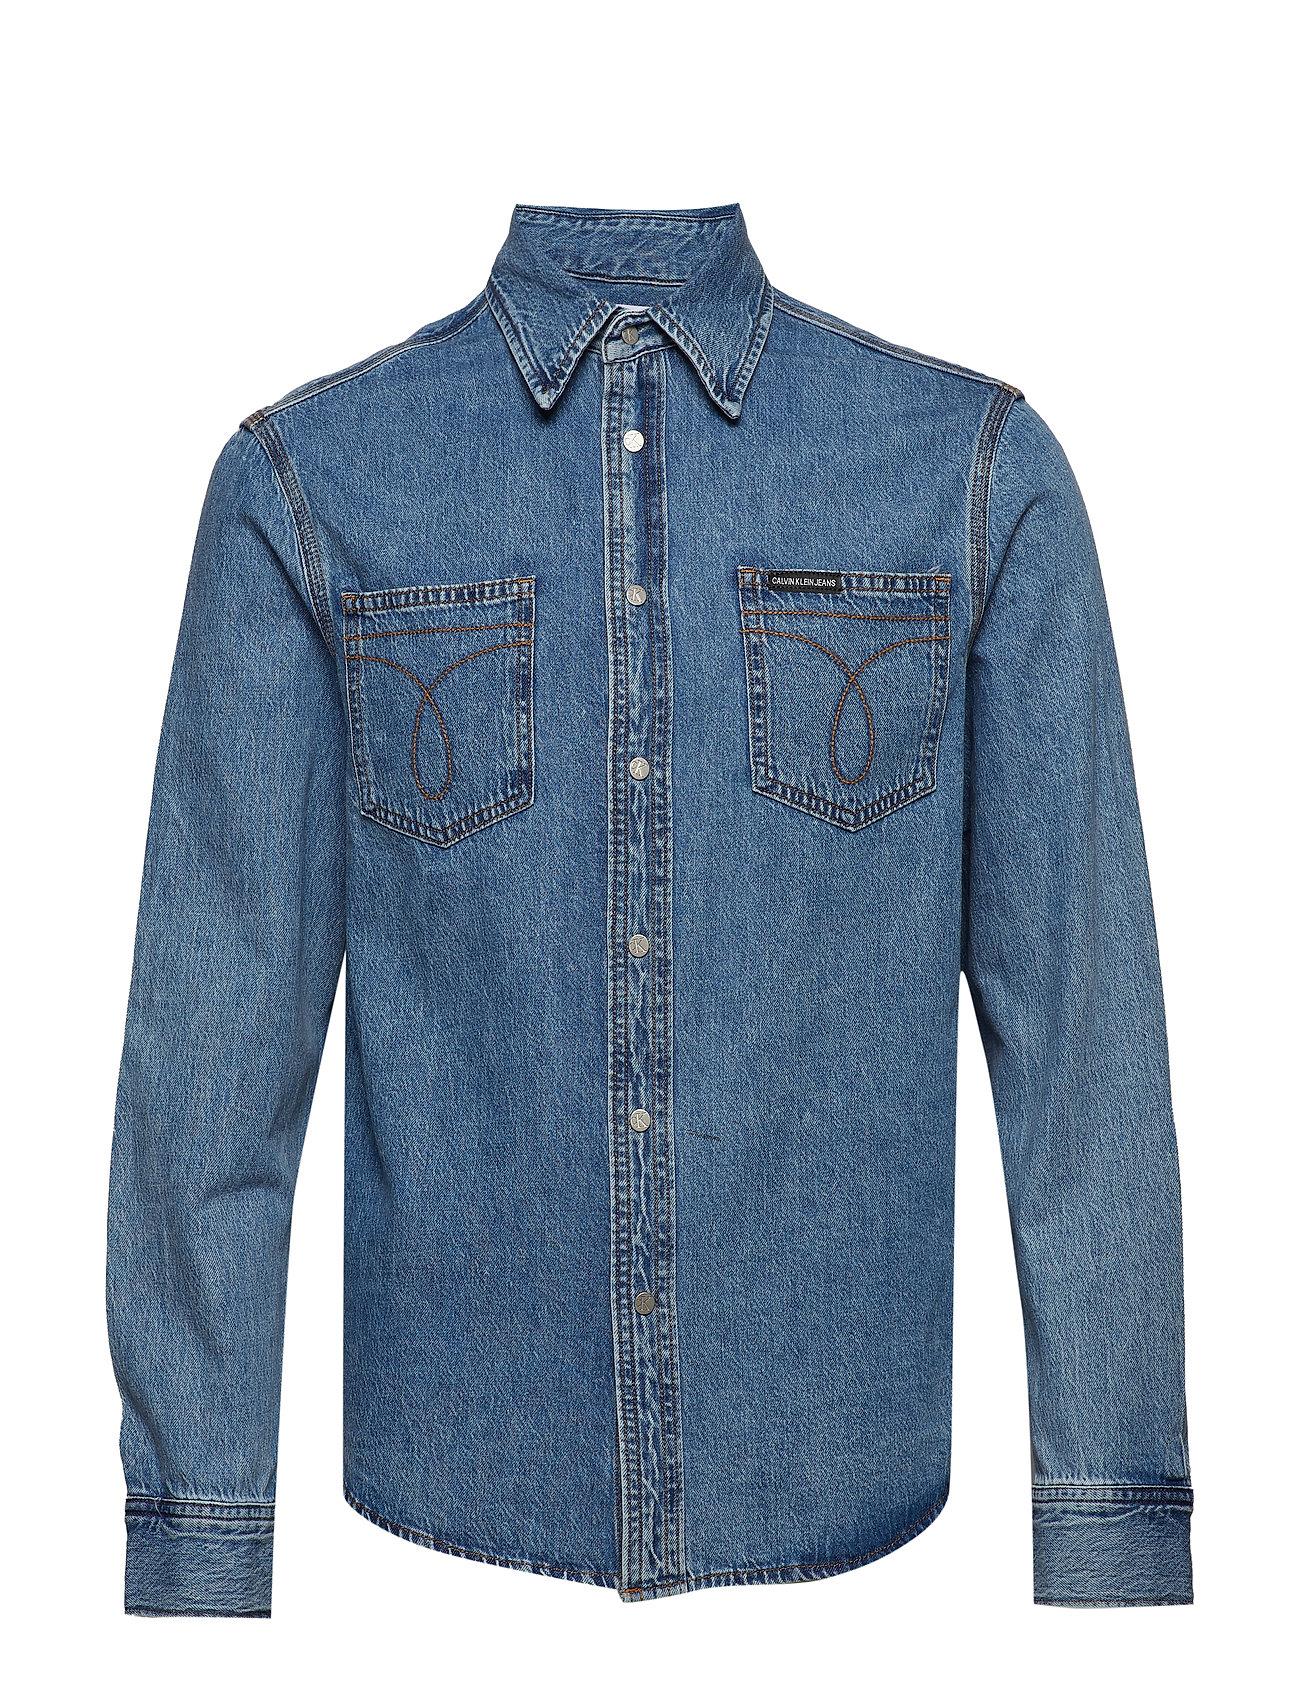 c71a04be58 Long Sleeve Utility Omega Shirt (Iconic Mid Stone) (900 kr) - Calvin ...